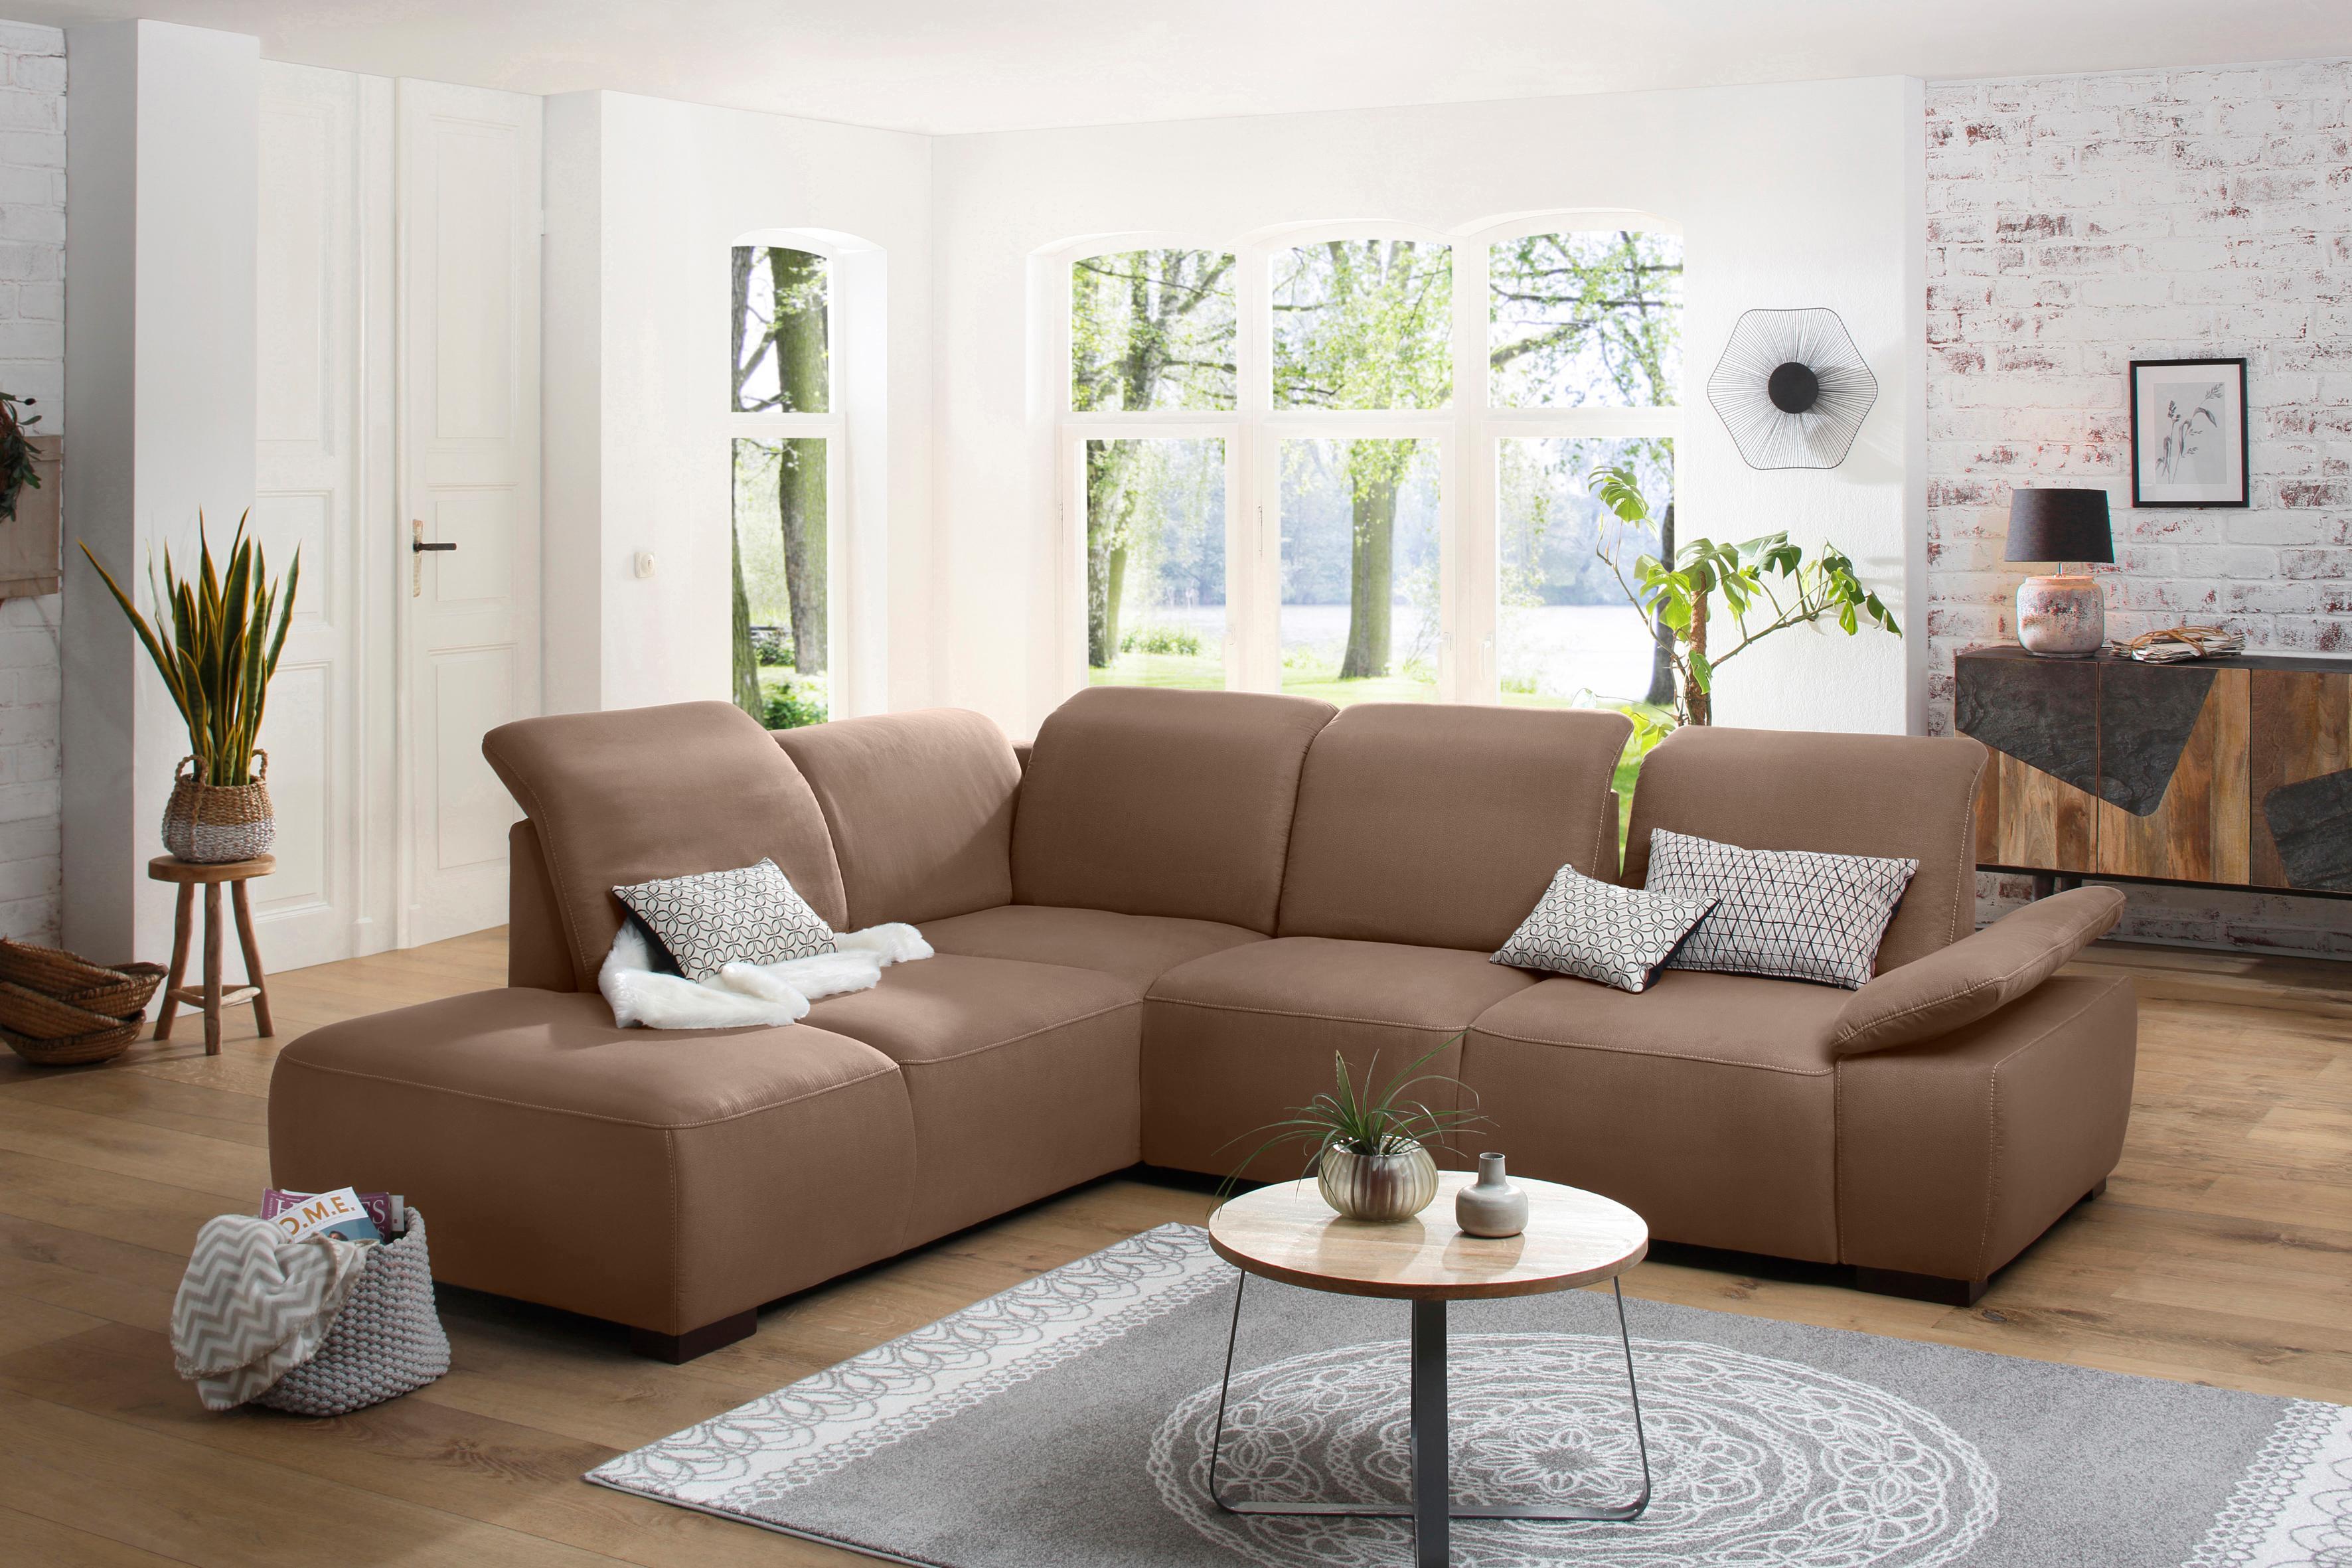 Home affaire Ecksofa Tobago | Wohnzimmer > Sofas & Couches > Ecksofas & Eckcouches | Braun | Home Affaire